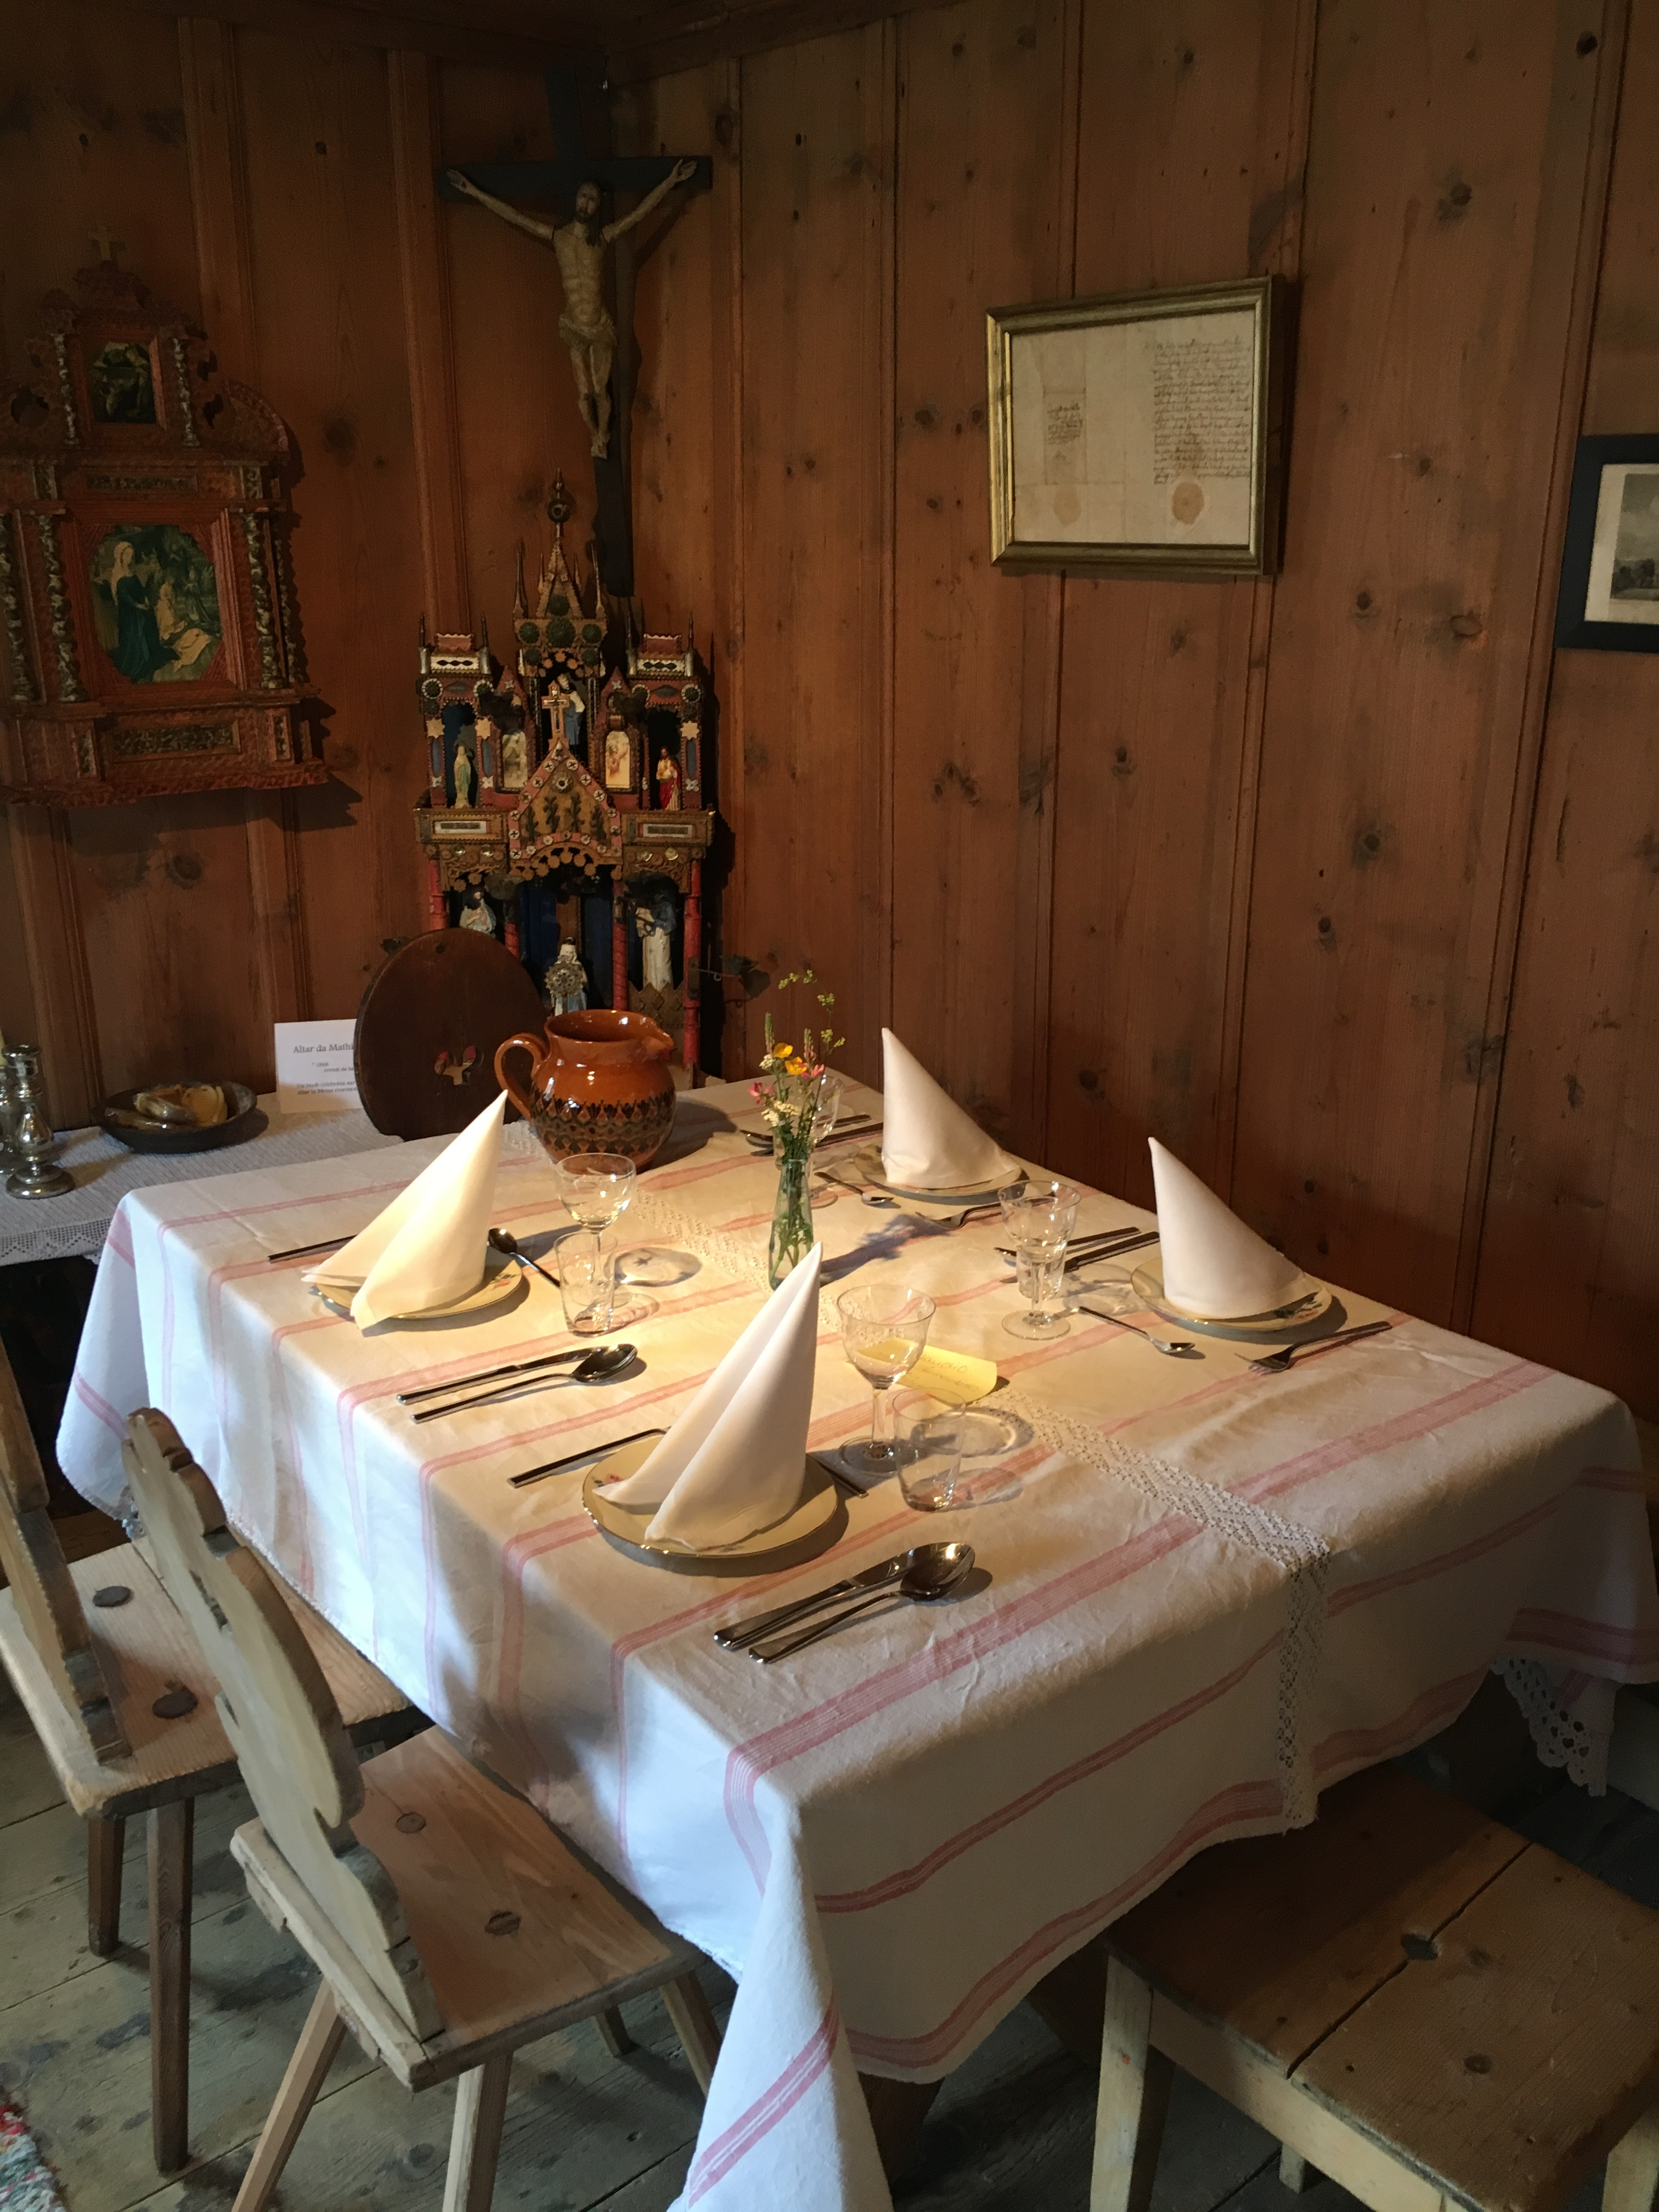 Museum Laax - Essen wie zu Grossmutters Zeiten